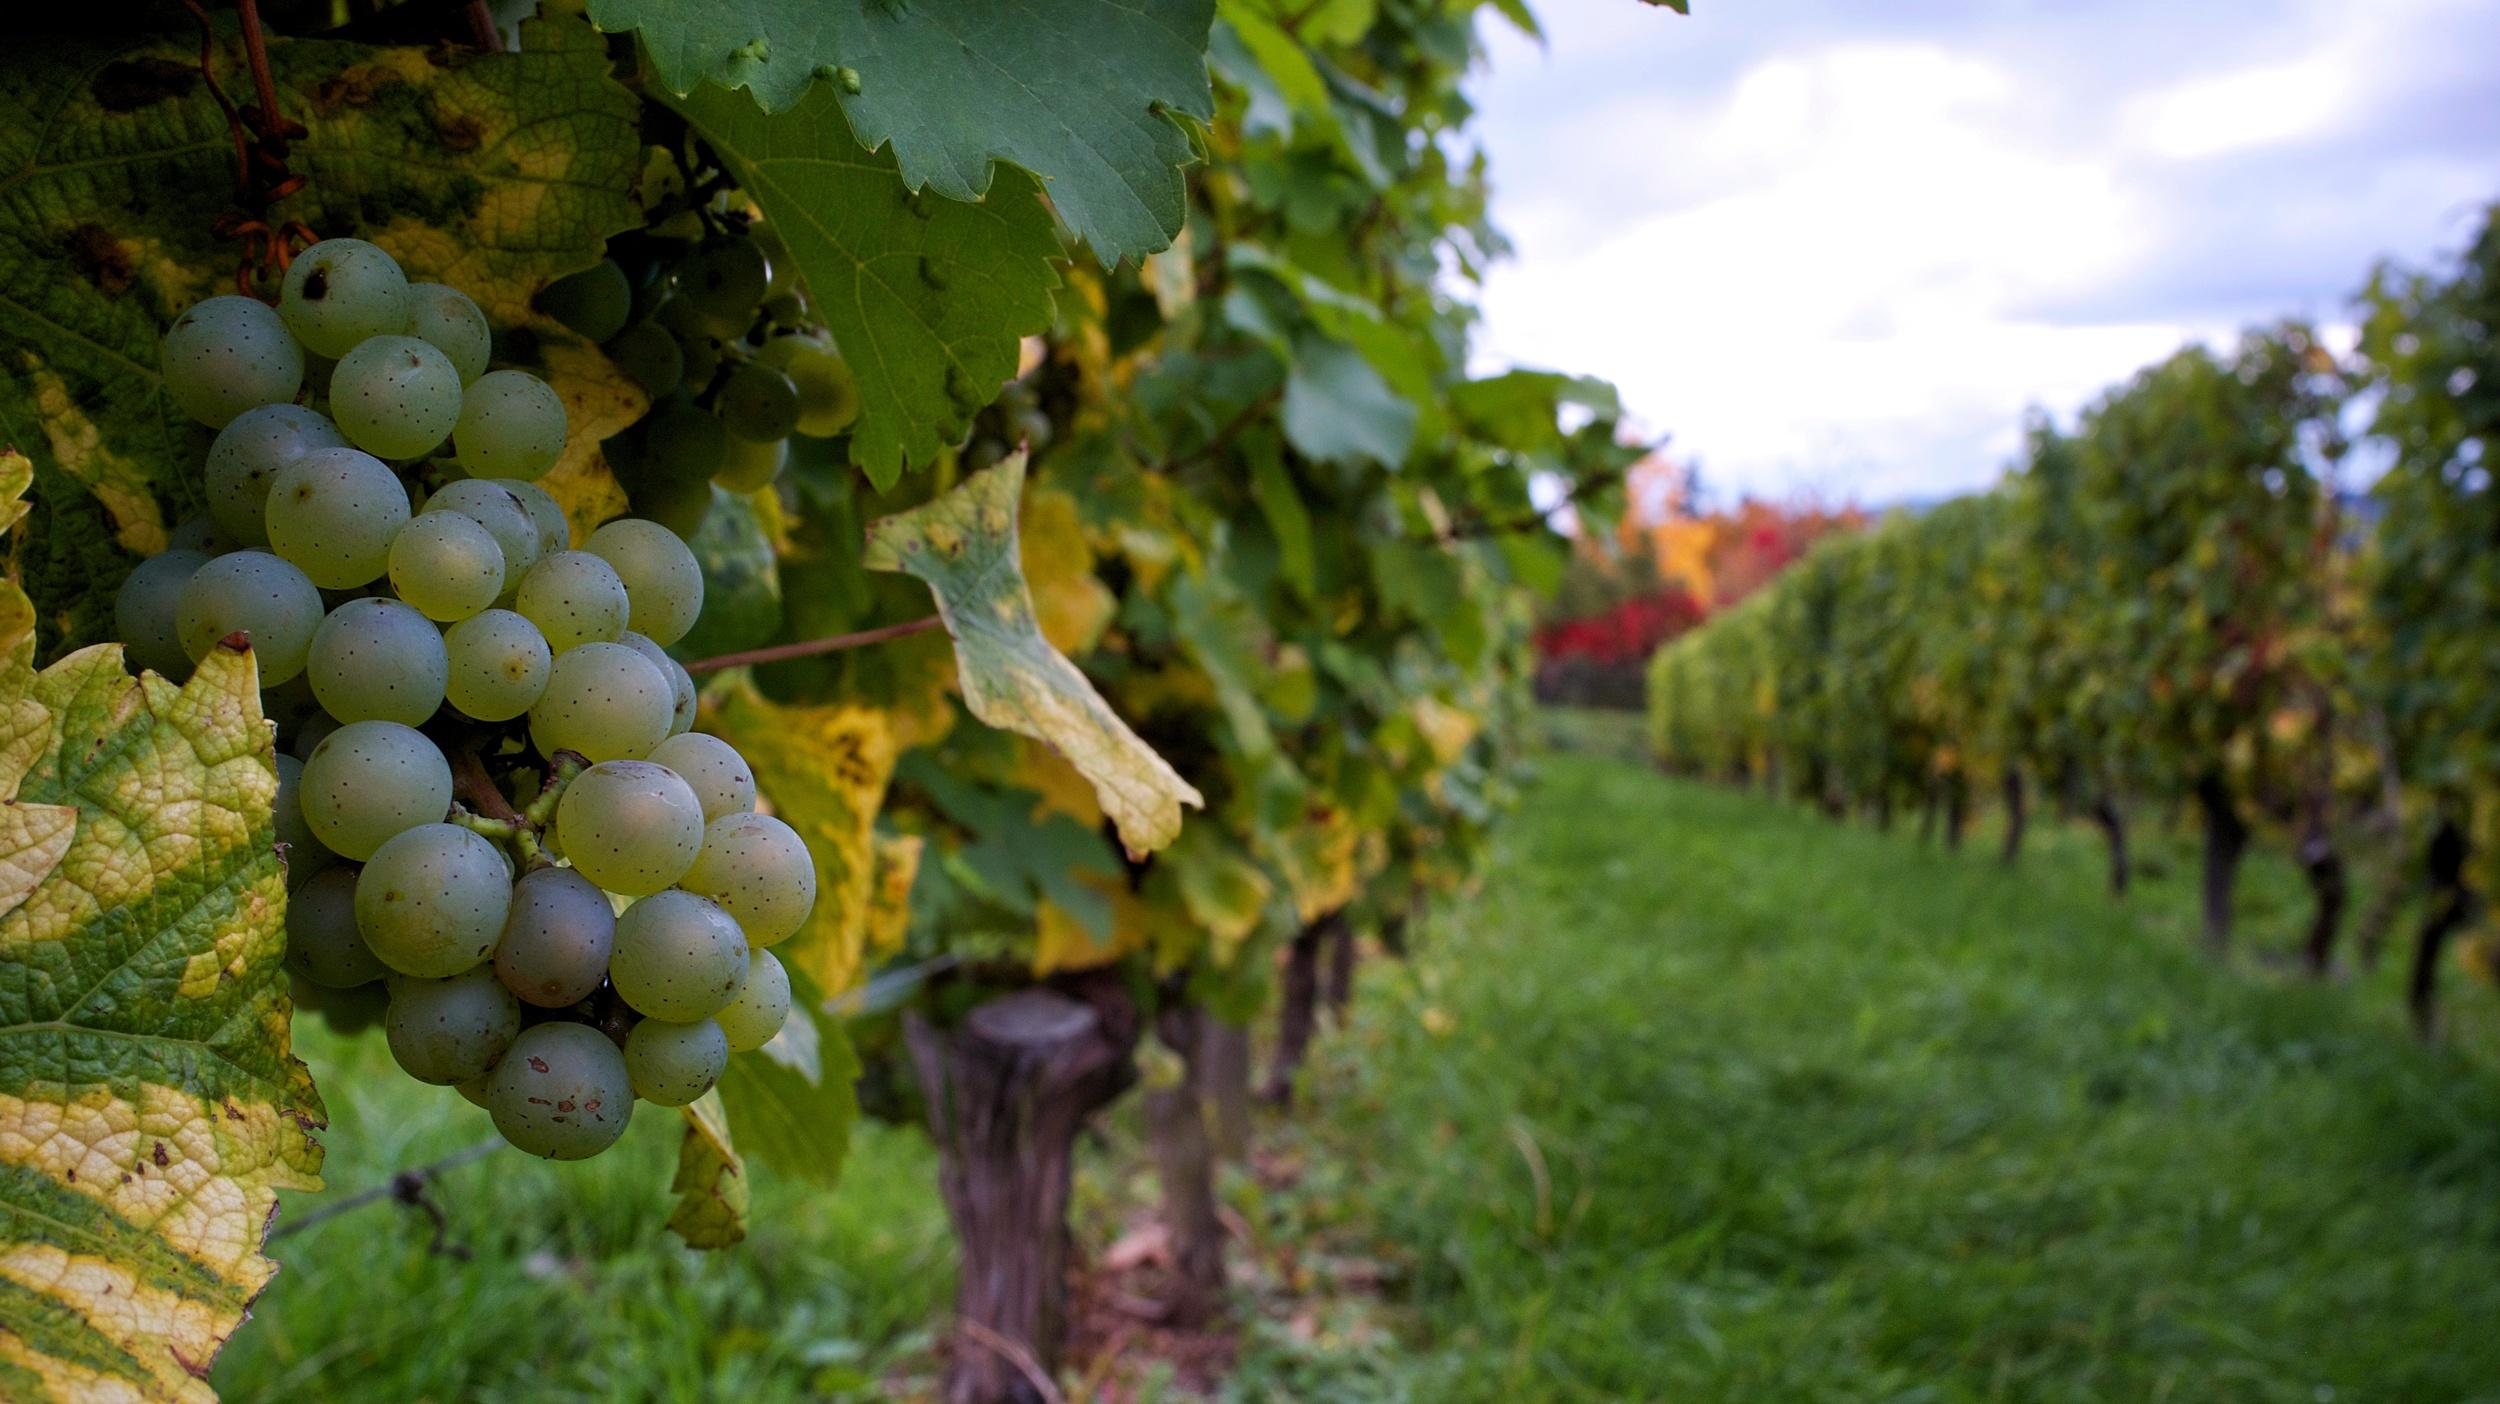 Johannisberg's vines